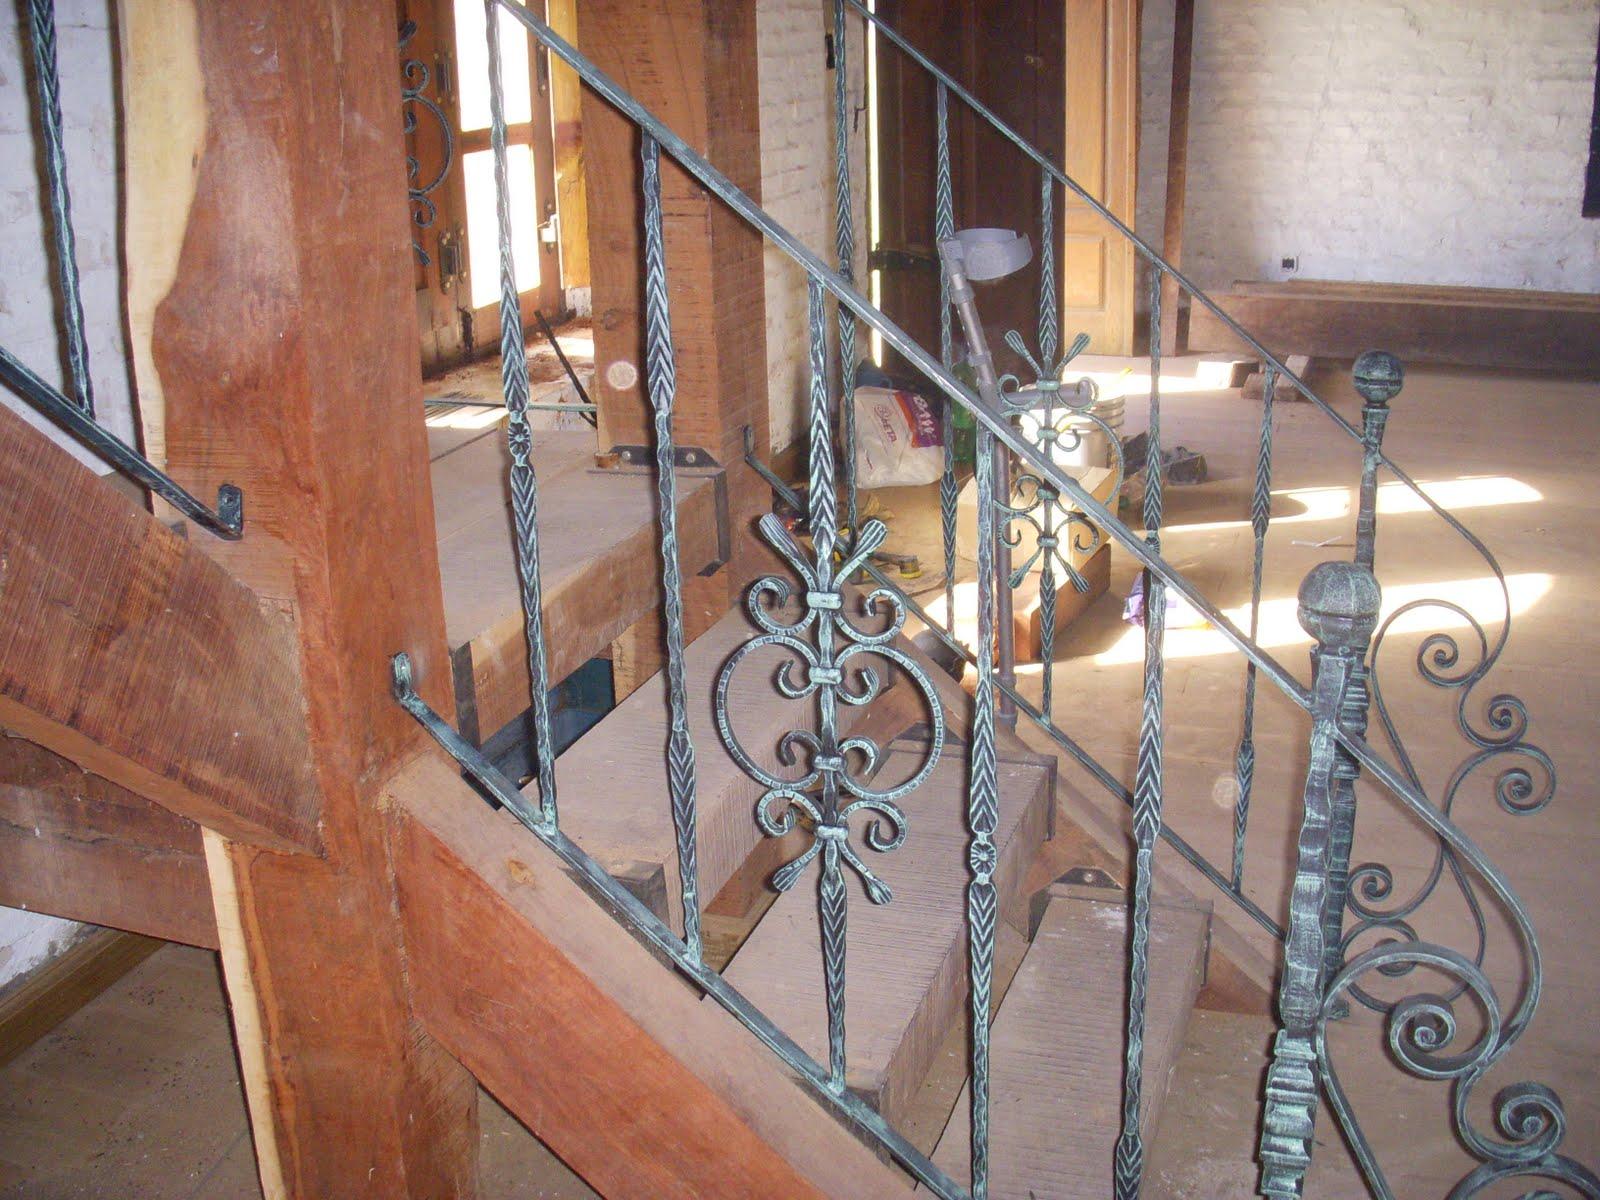 Forjados la farolera baranda de escalera de hierro forjado for Escaleras hierro forjado